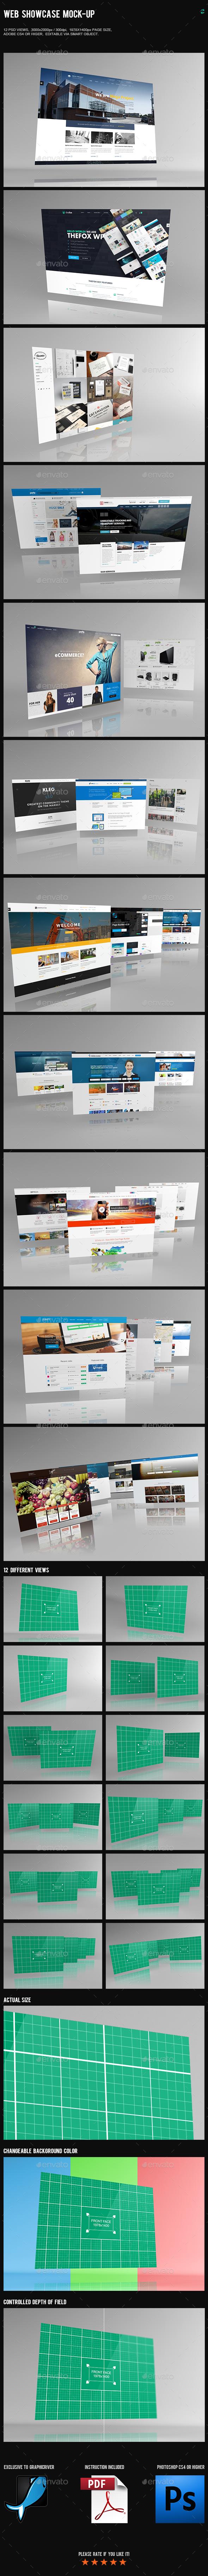 Web Showcase Mock-Up - Website Displays